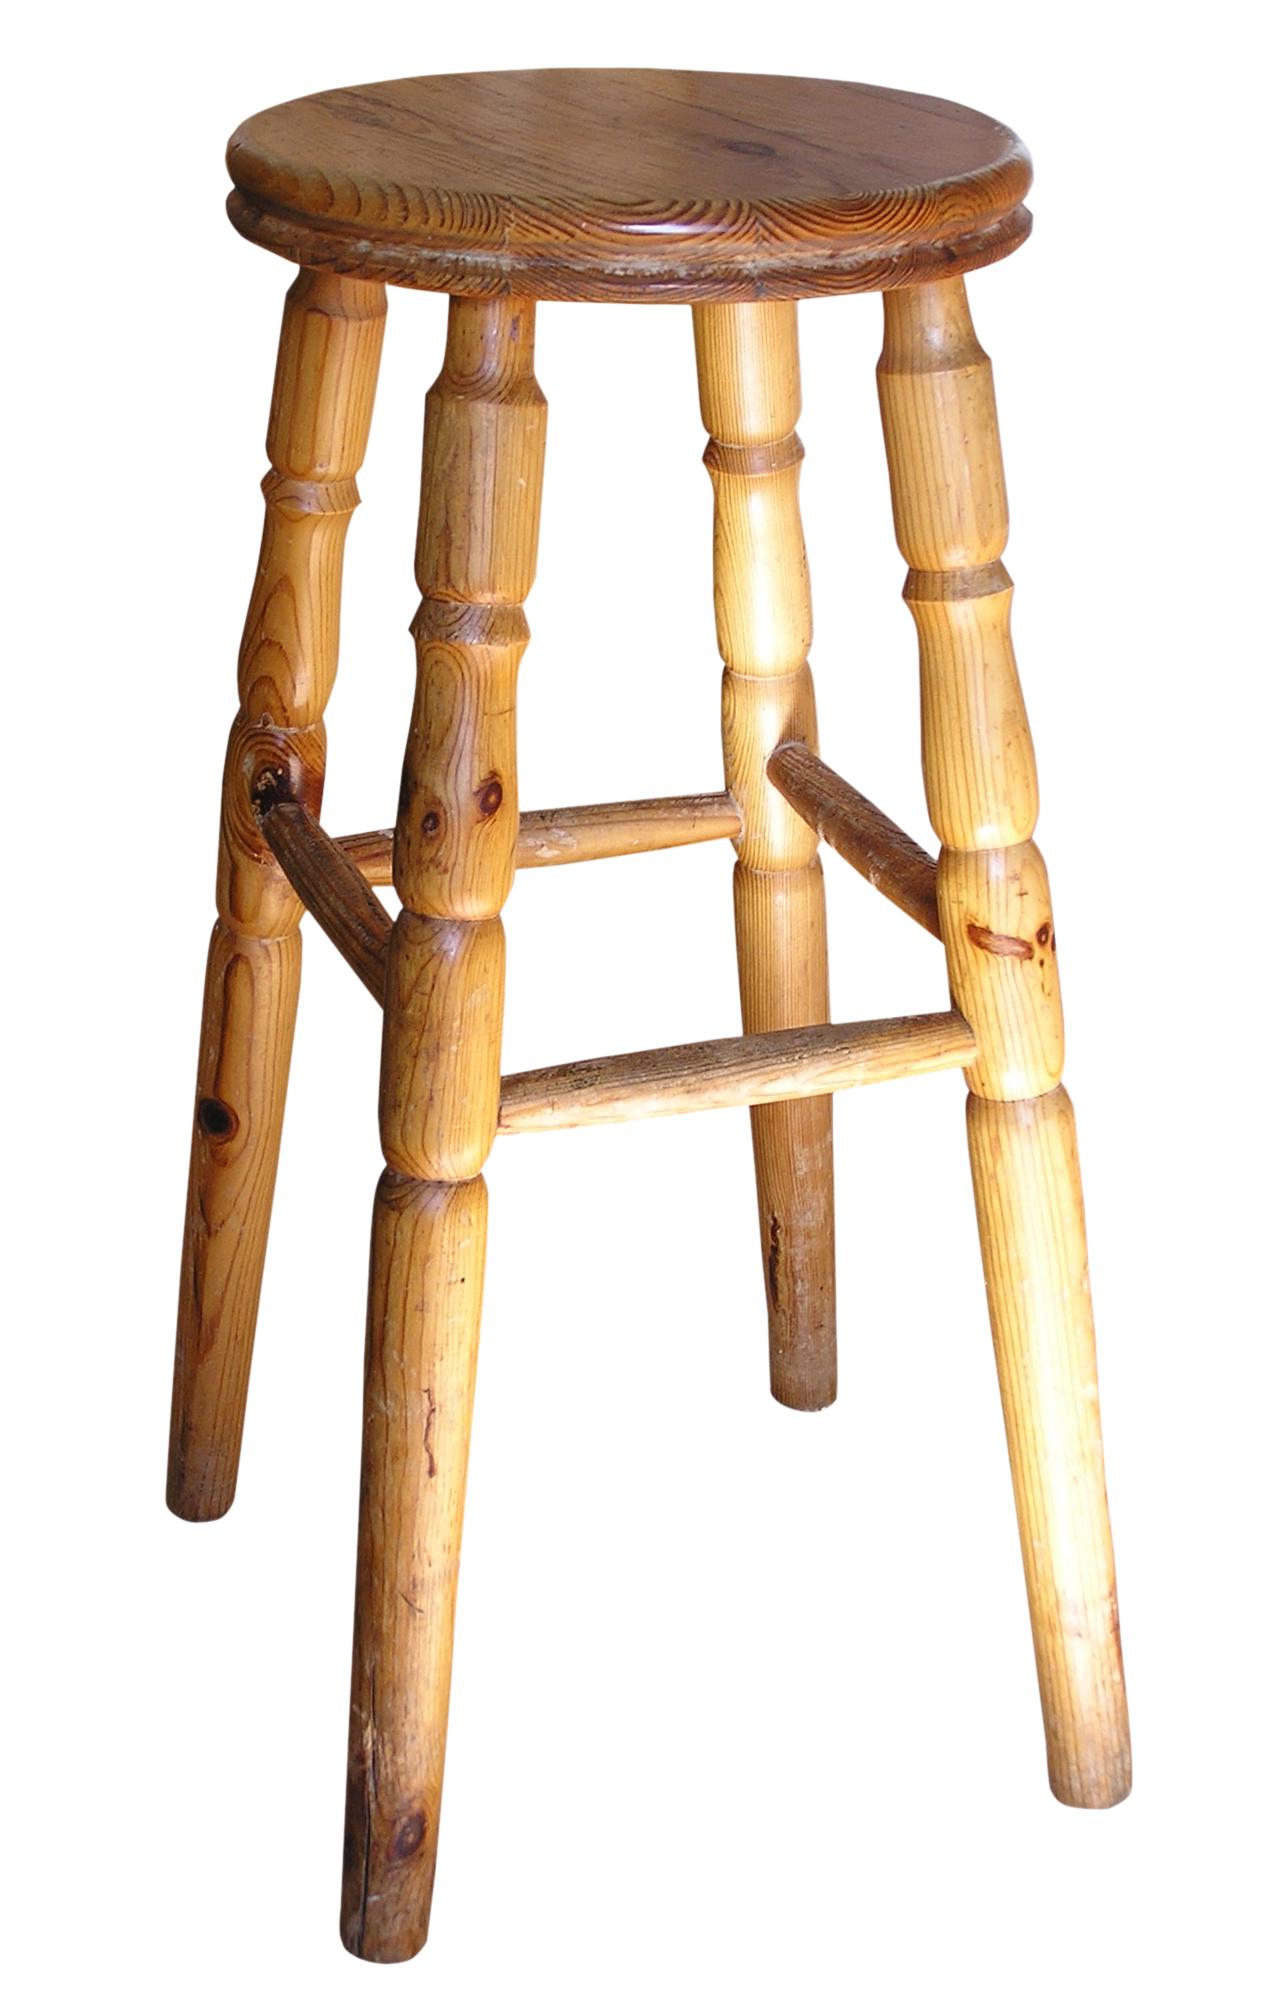 Kitchen stool chairs Photo - 1